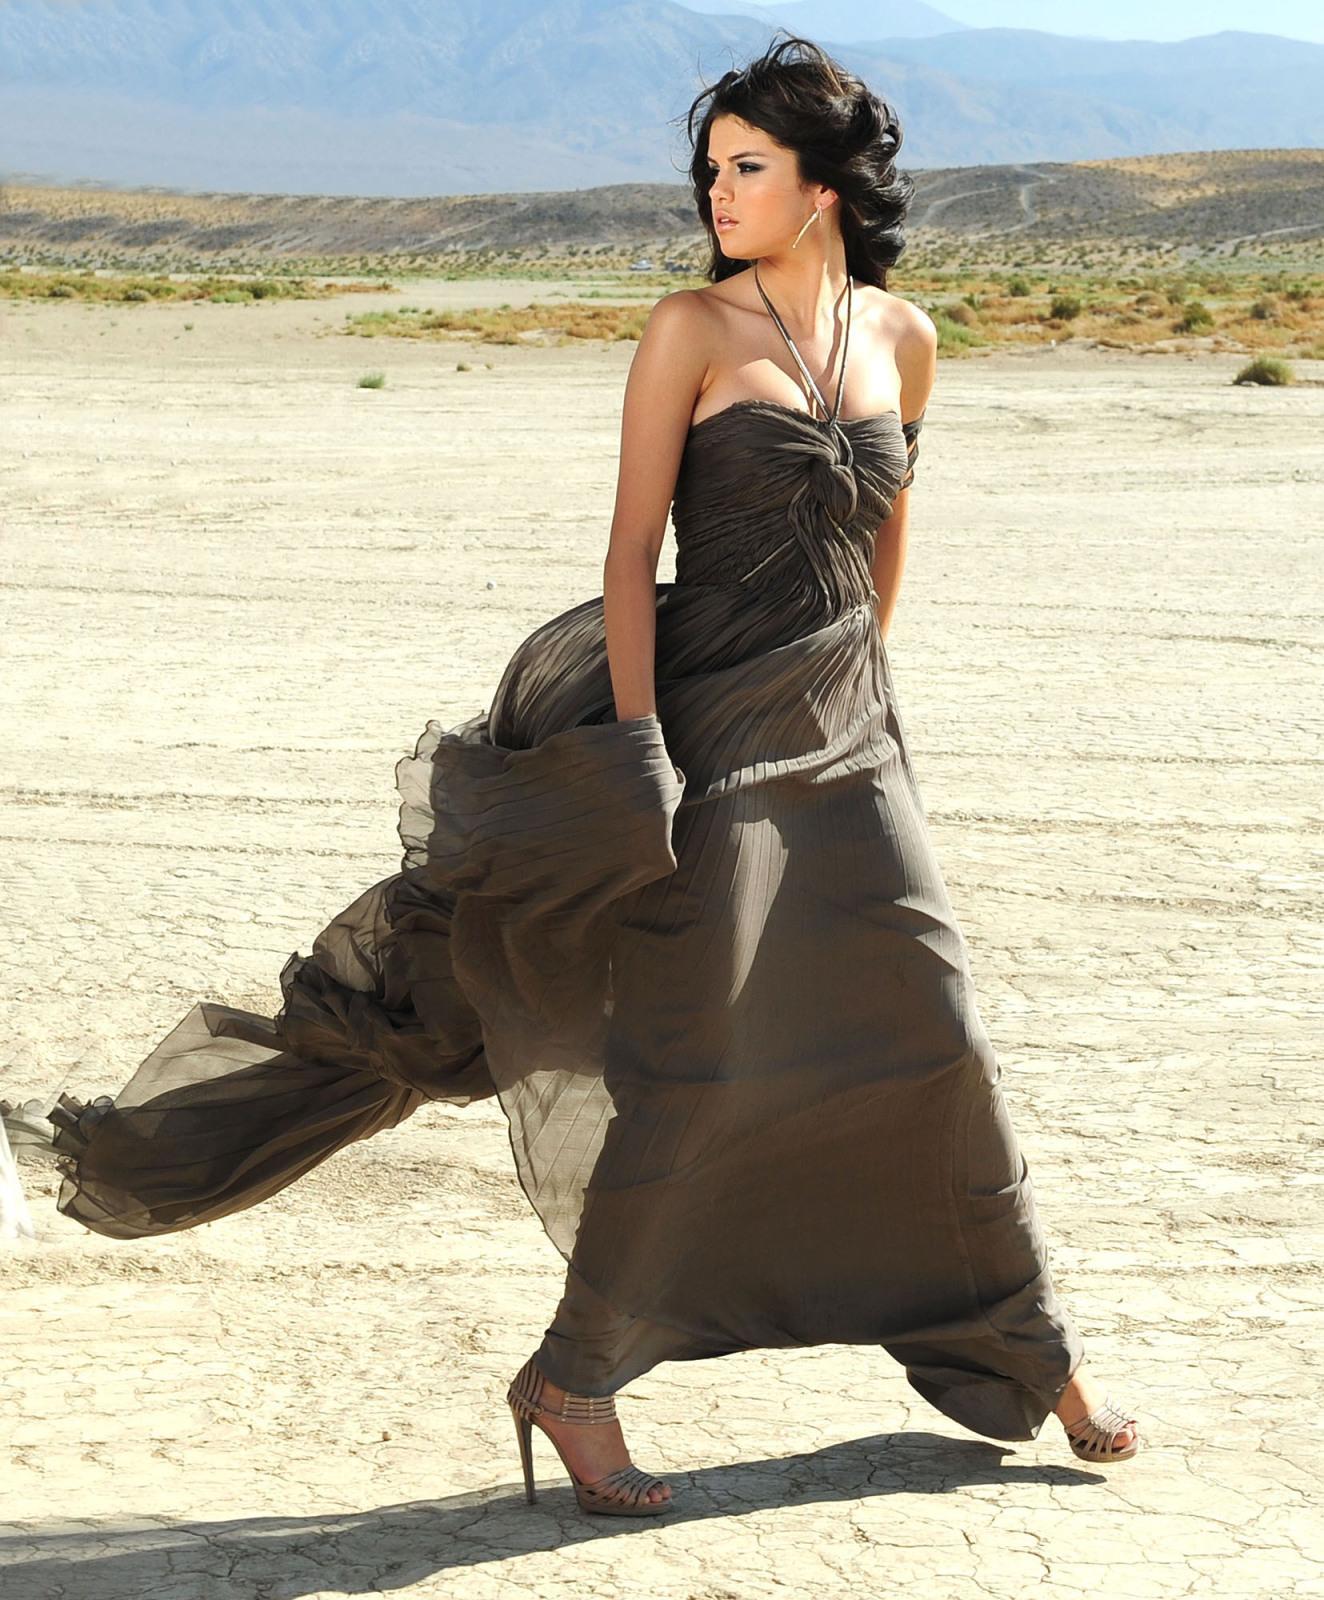 Bravo Wallpaper: Selena Gomez Hot Wallpapers Pack 2